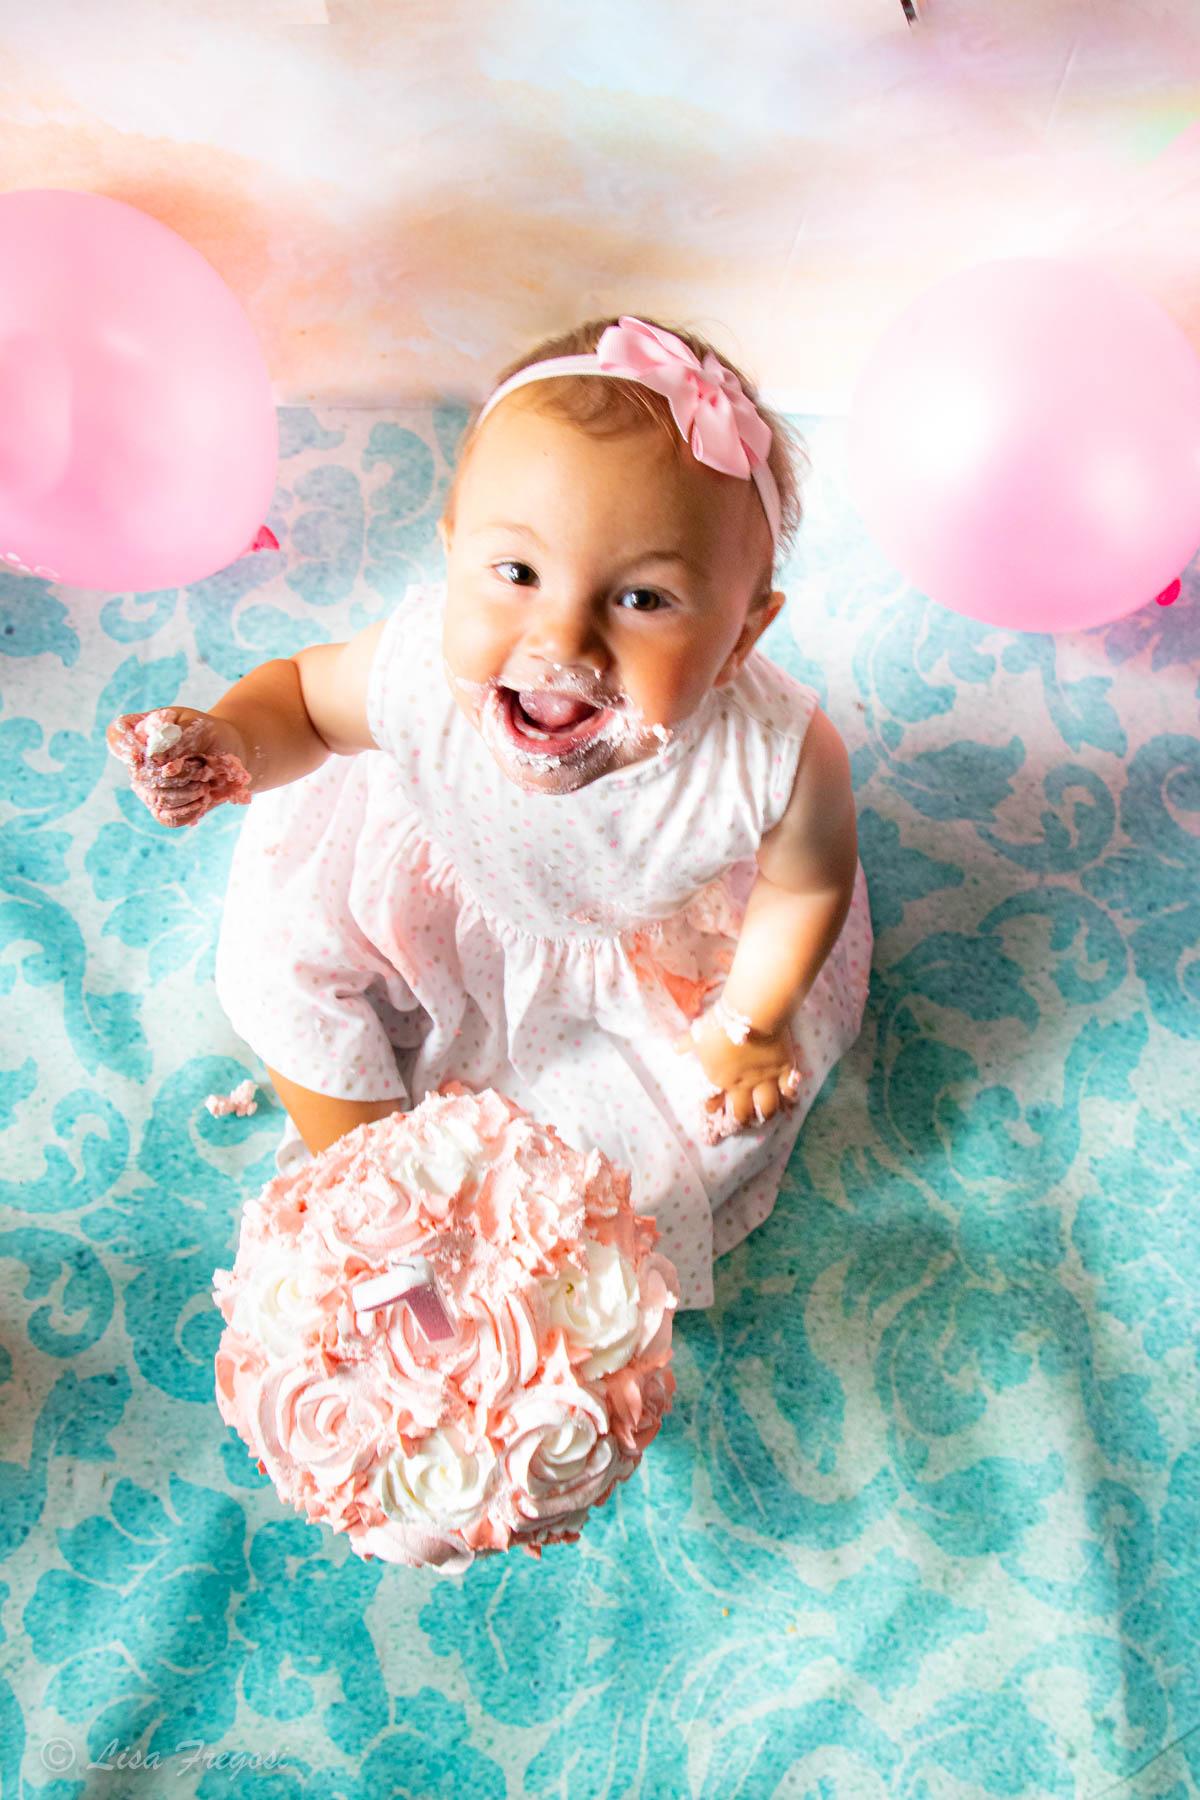 children & baby Photography